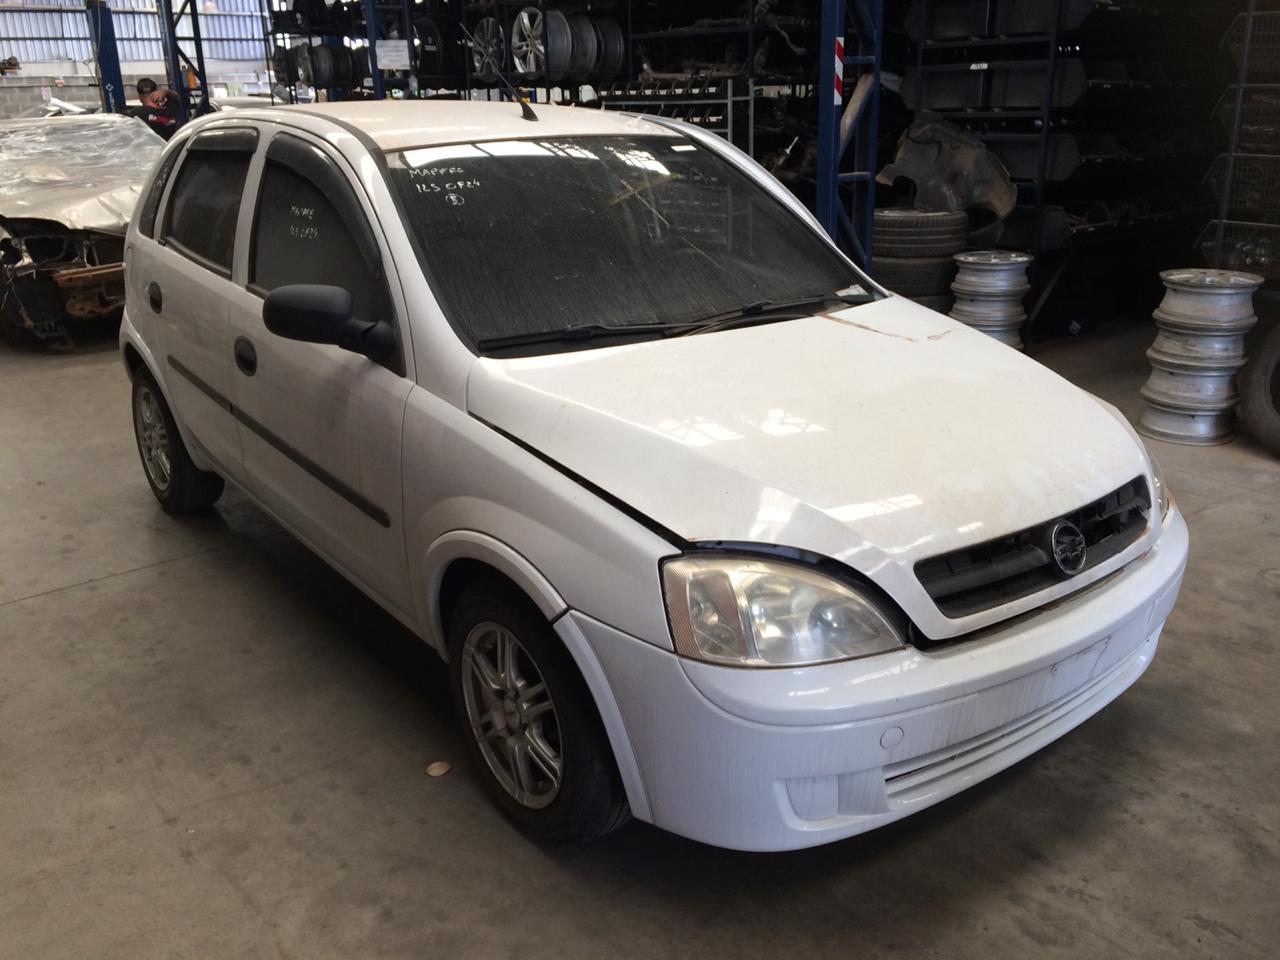 Corsa Hatch 04-04 - 1